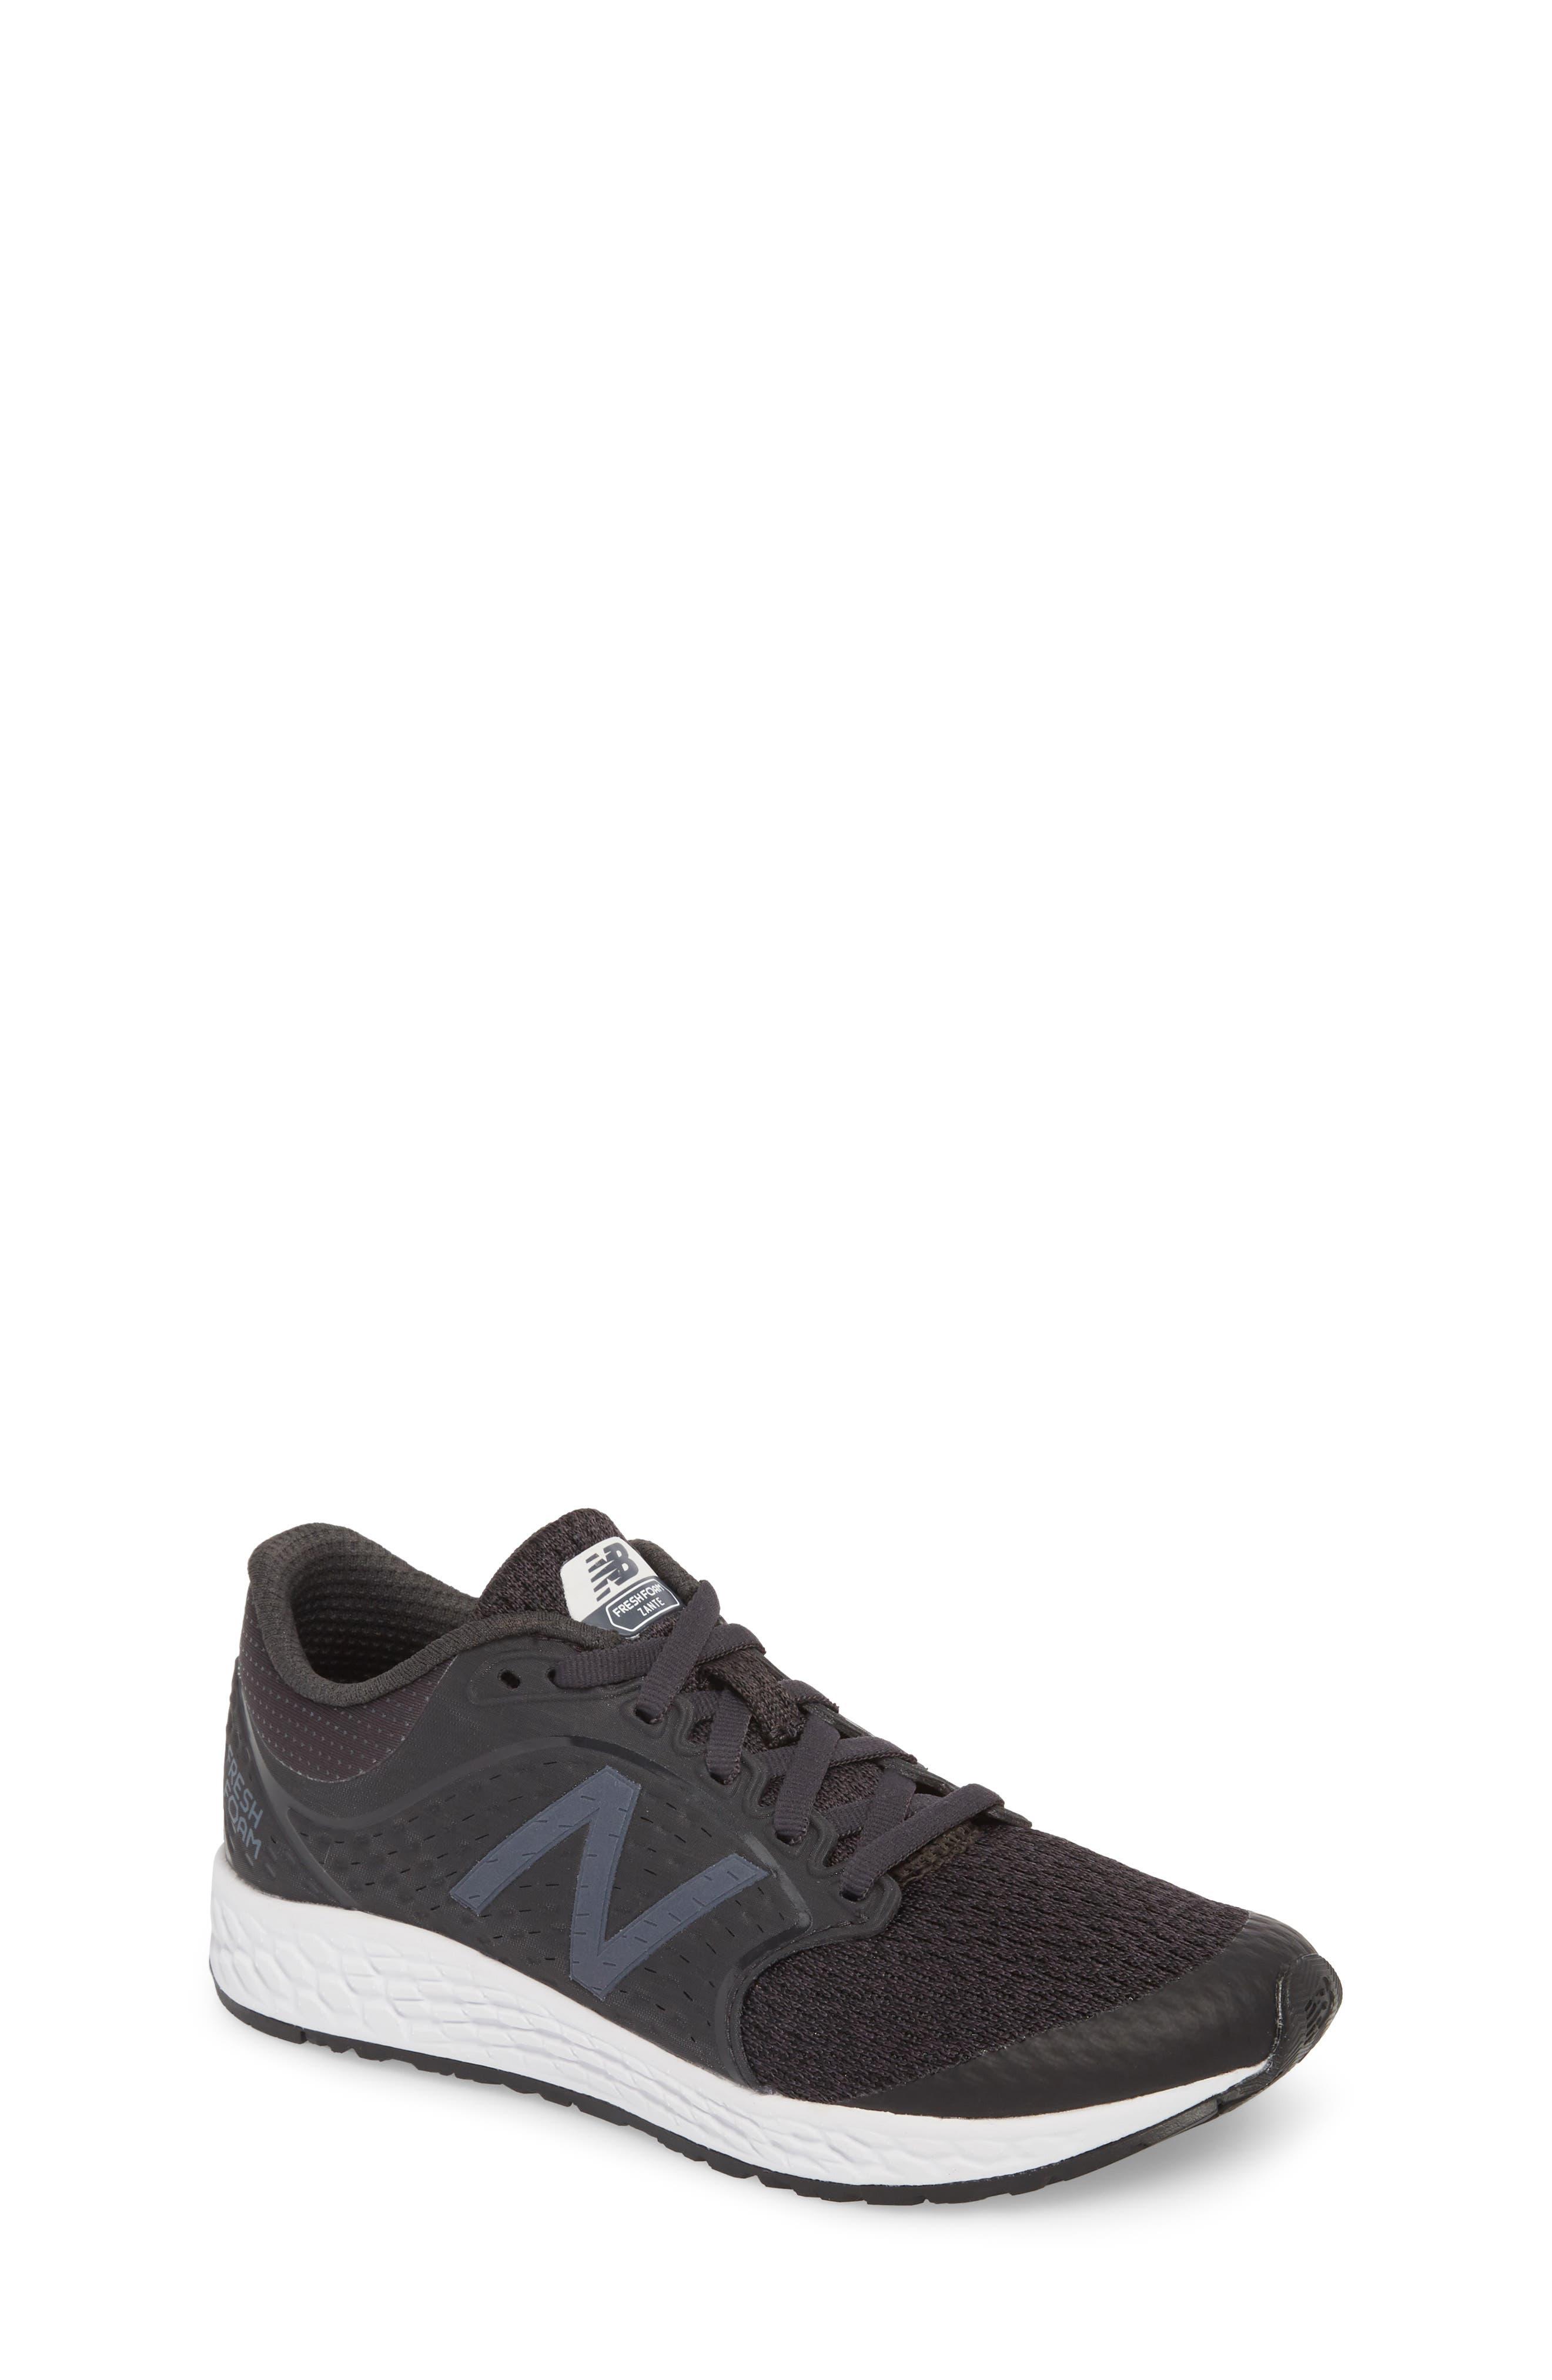 Fresh Foam Zante v4 Running Shoe,                         Main,                         color, Black/ White